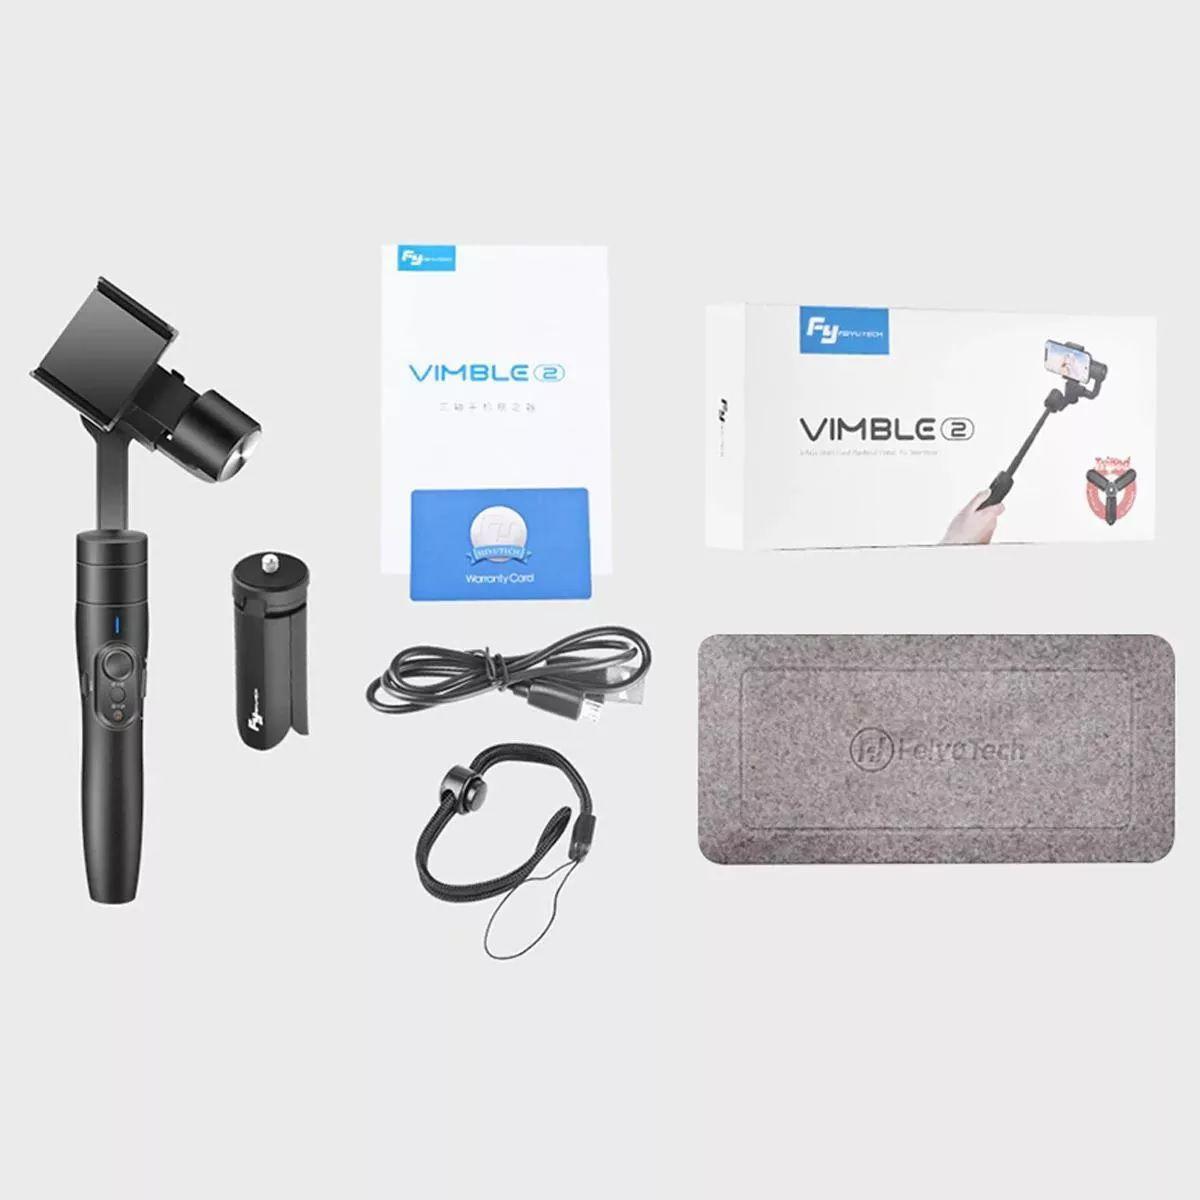 Gimbal Estabilizador Para Camera e Celular Vimble 2 - FI0382